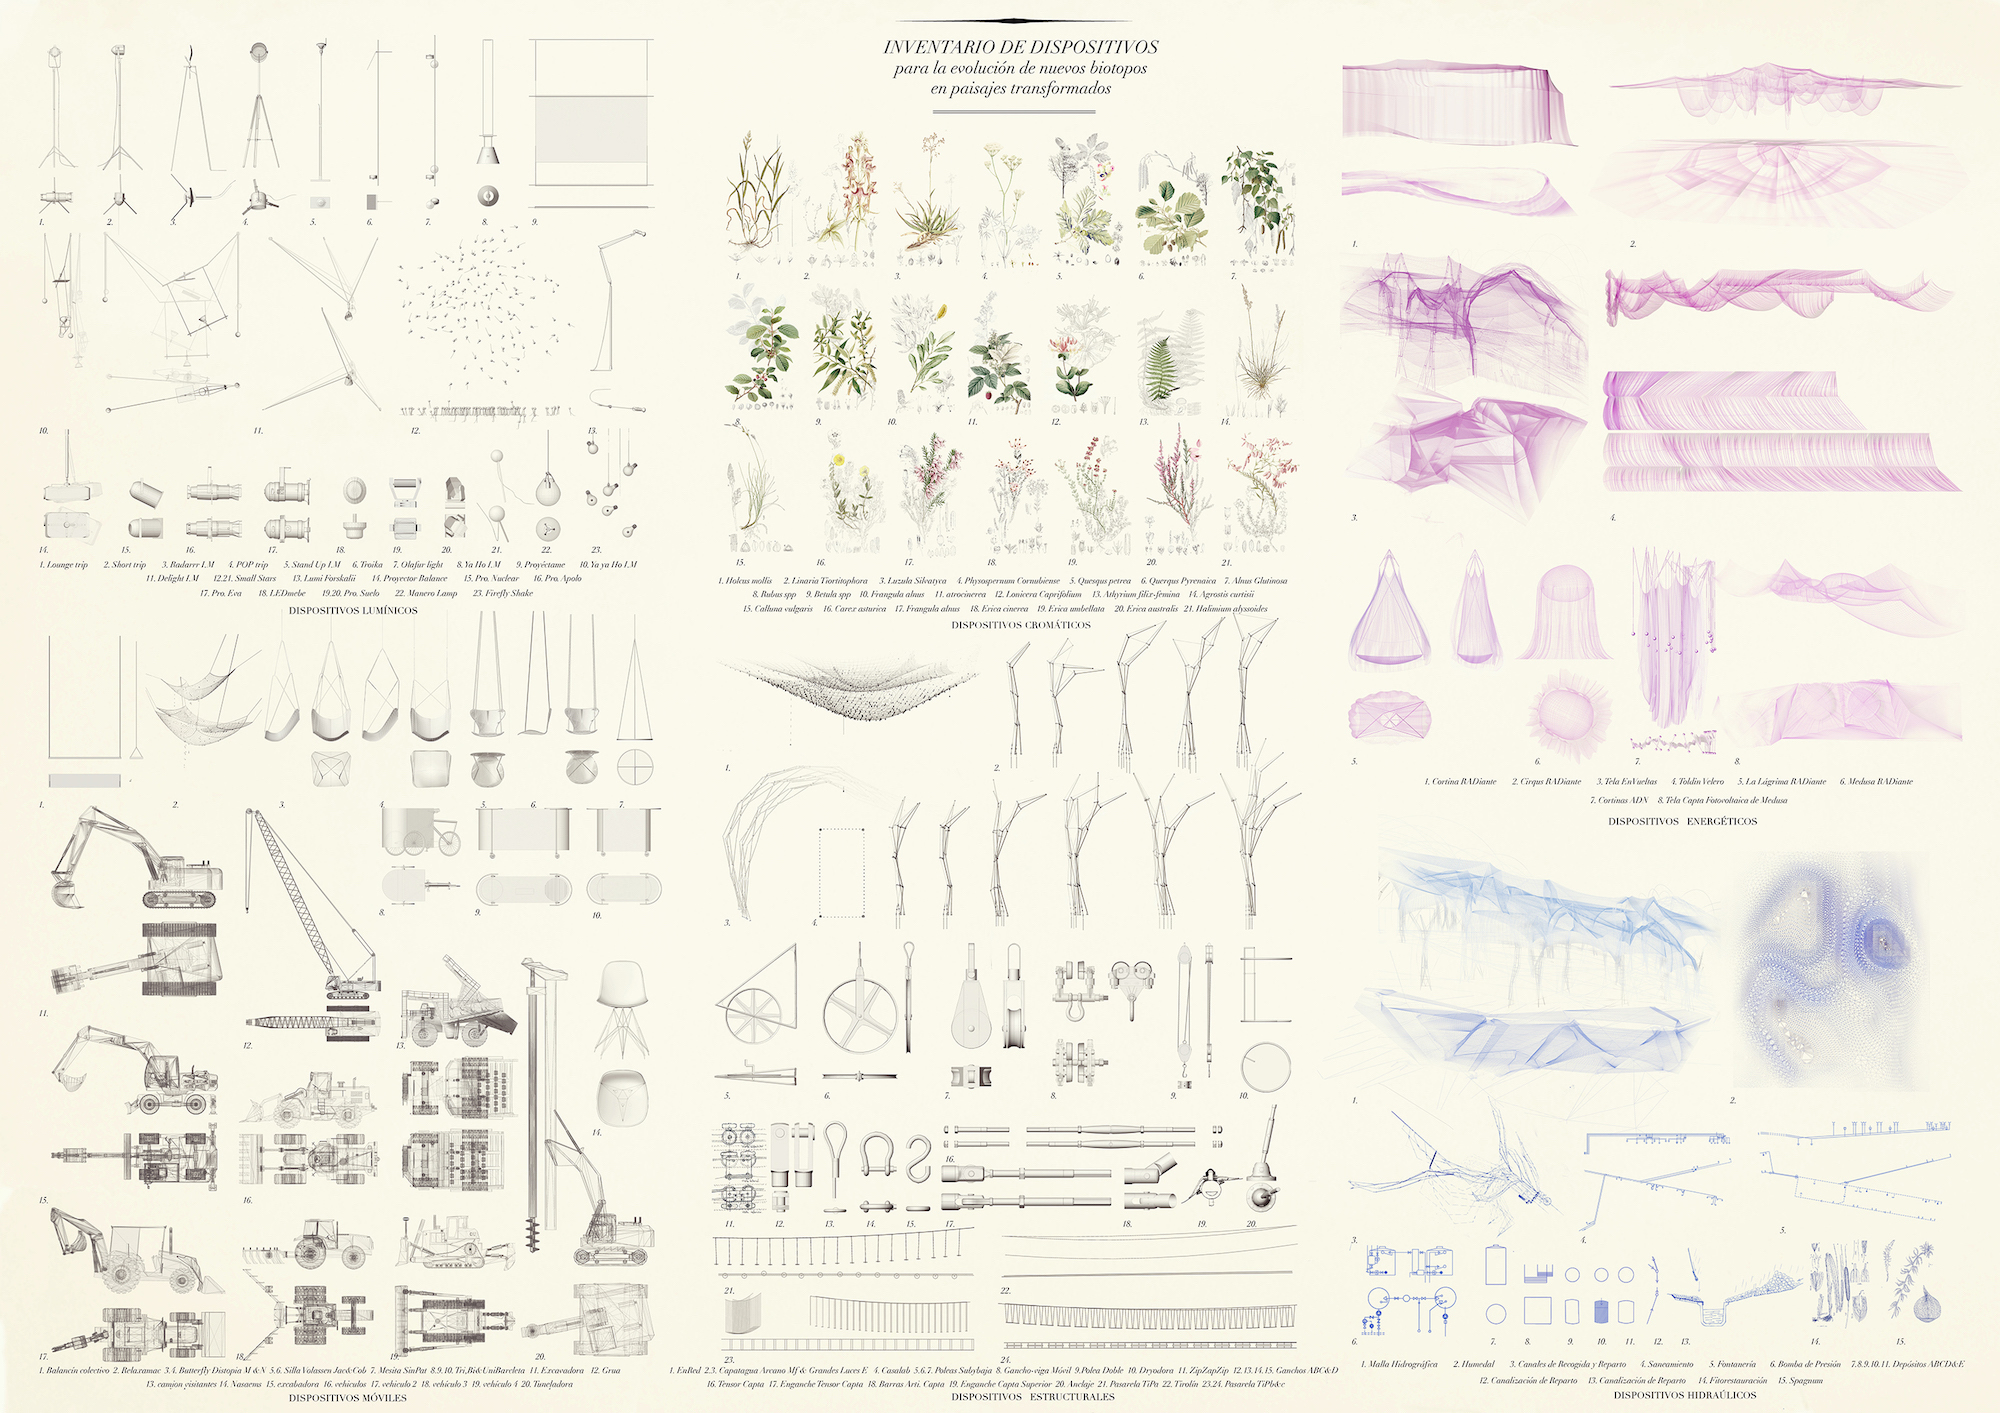 Biotopos Atlas